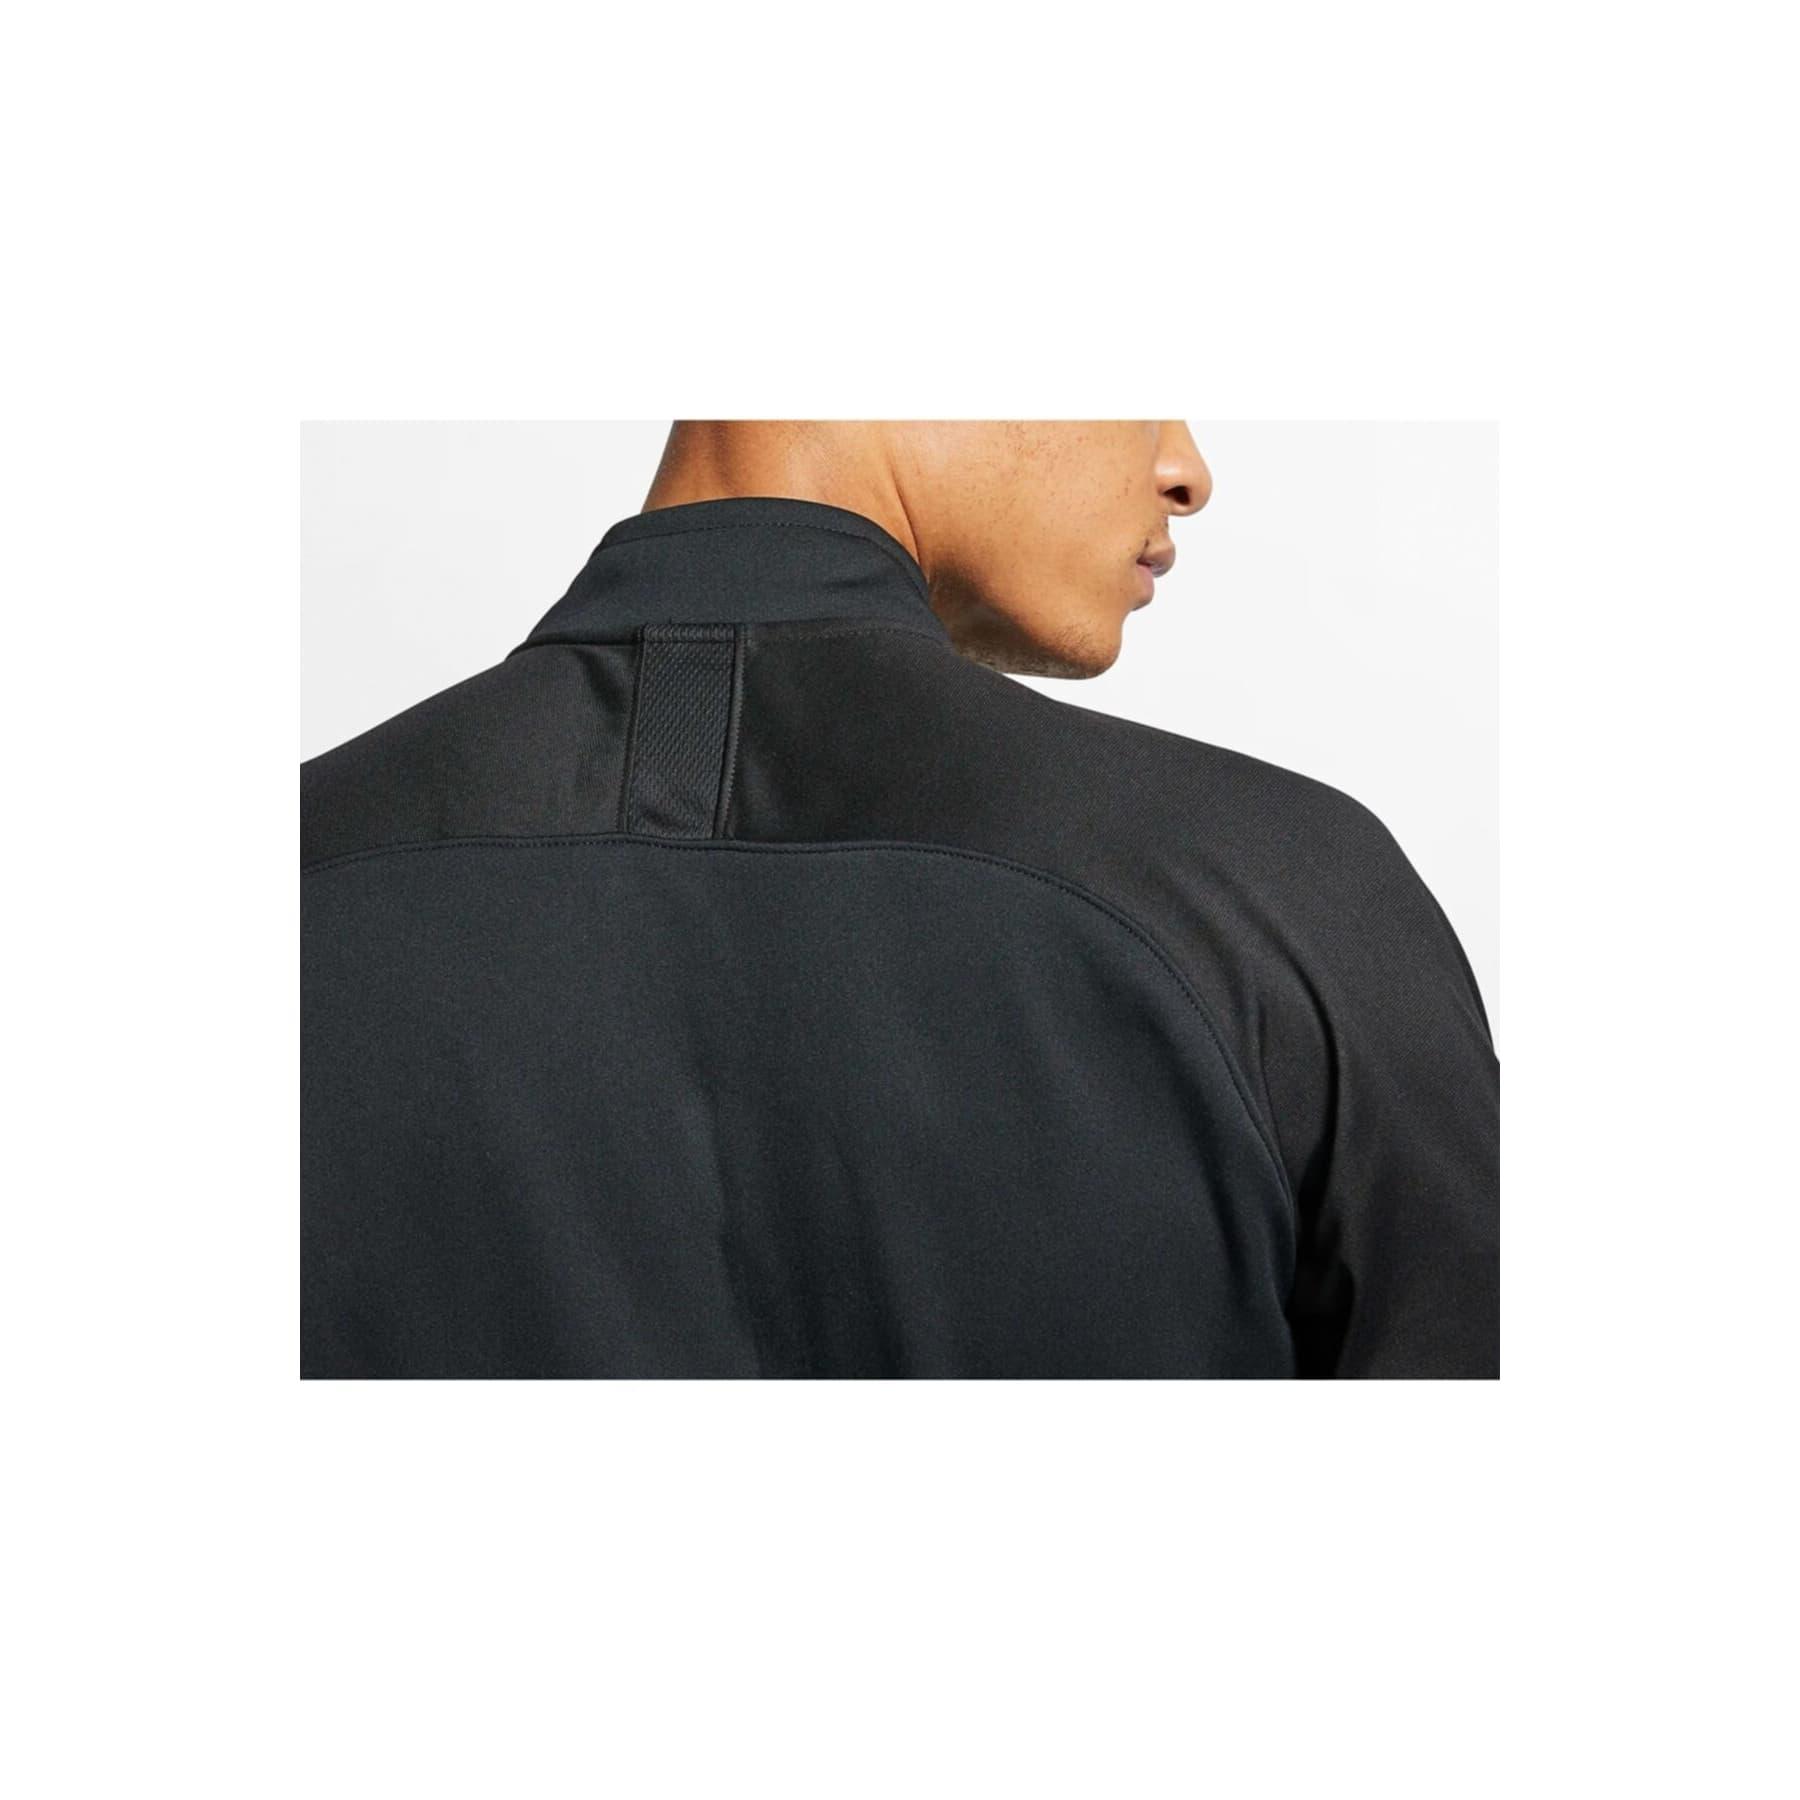 Dry Academy Erkek Siyah Antrenman Üstü (AJ9708-011)